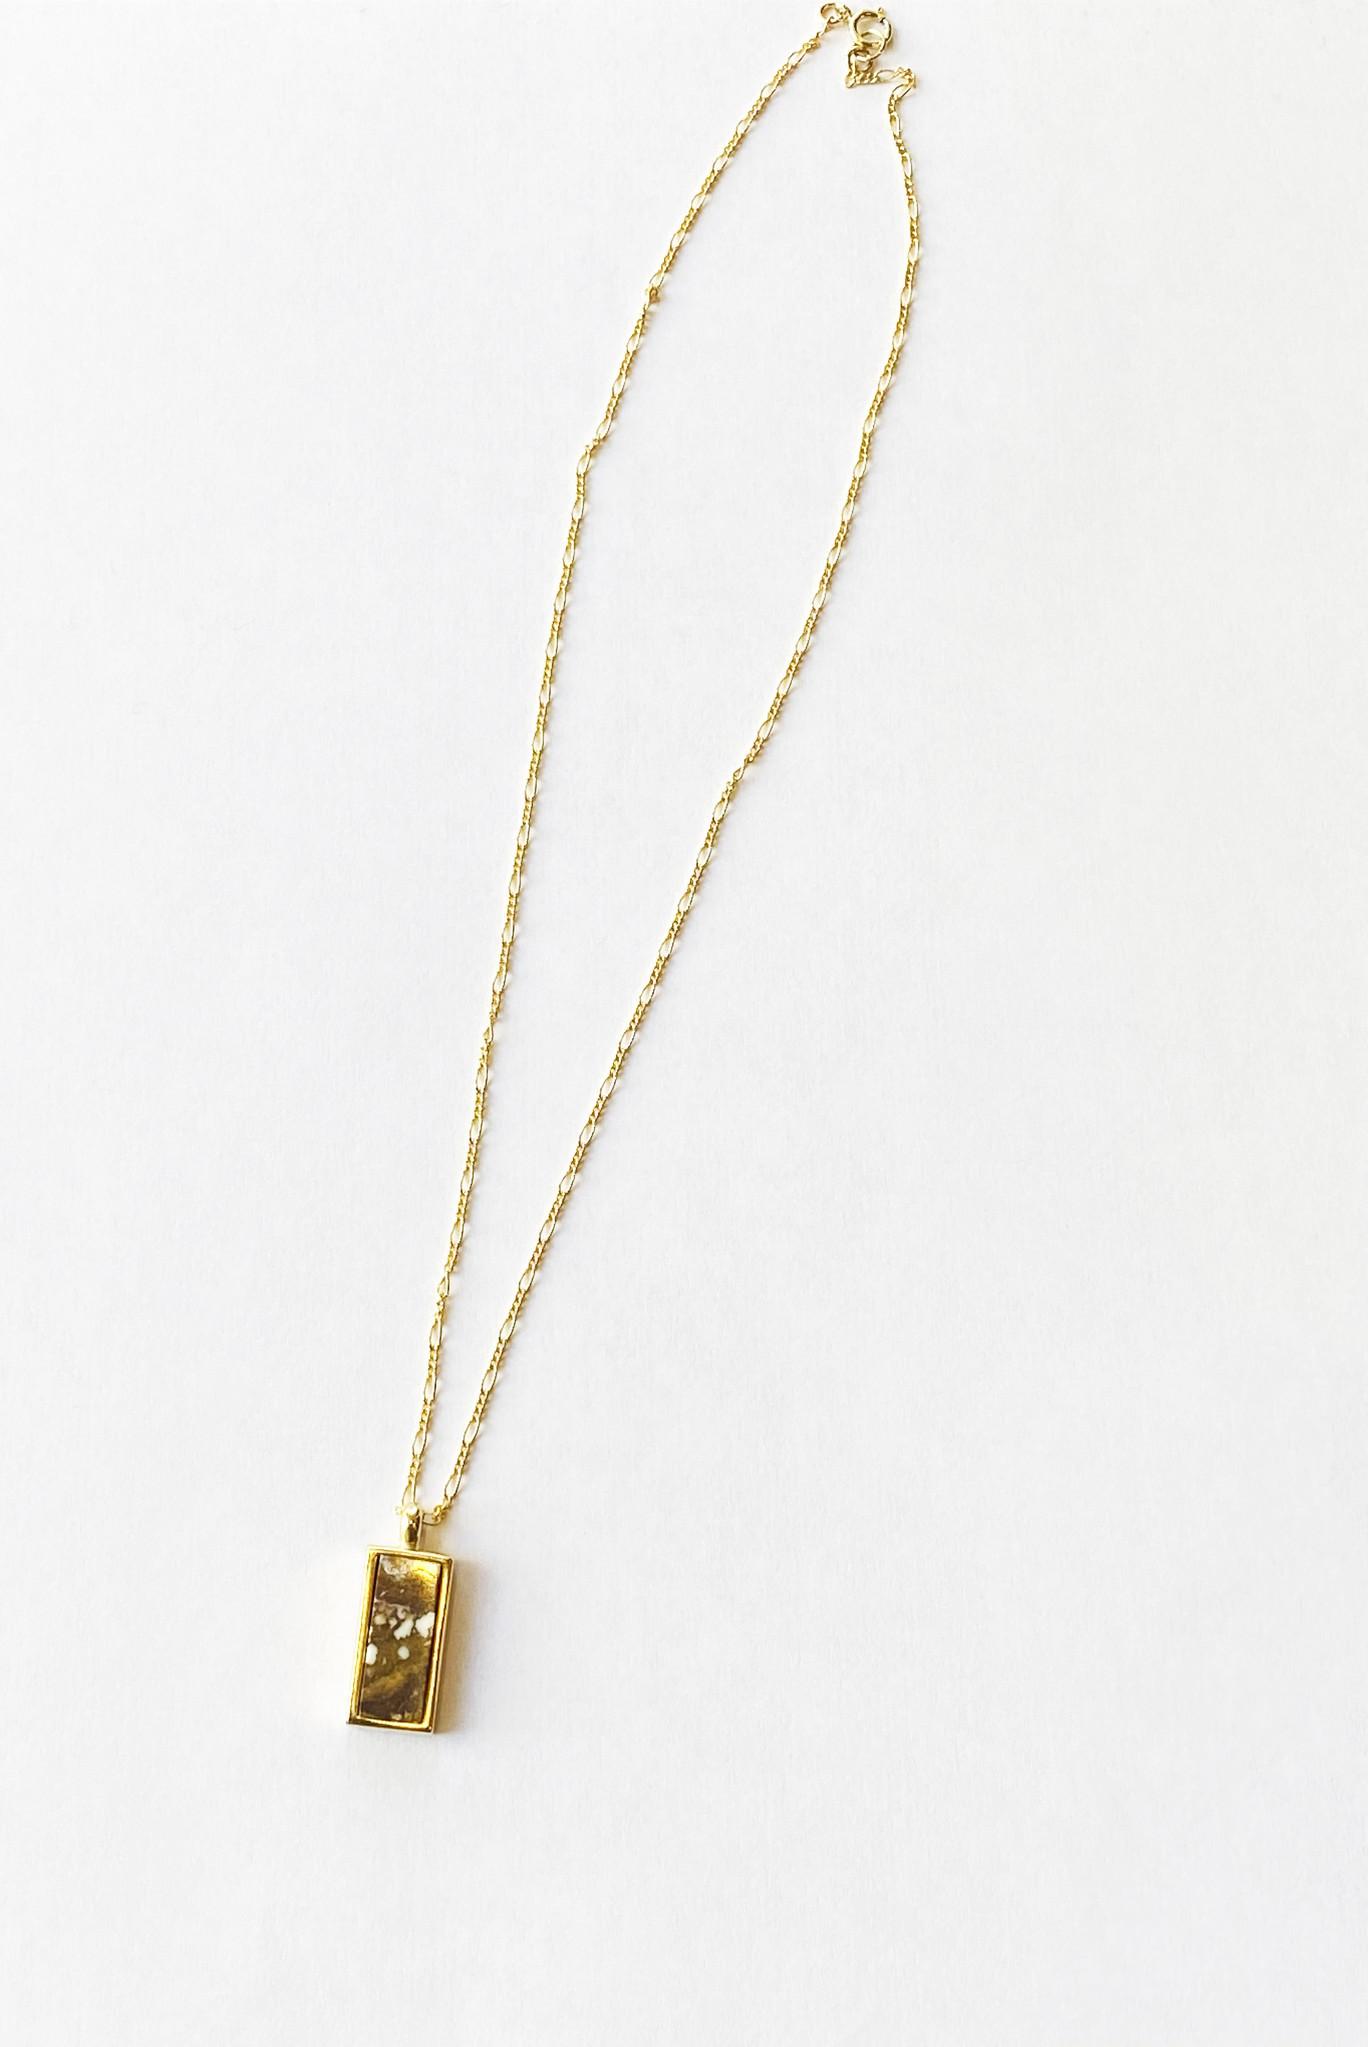 Sarah Safavi Jewelry Token Necklace in Wild Horse Magnesite